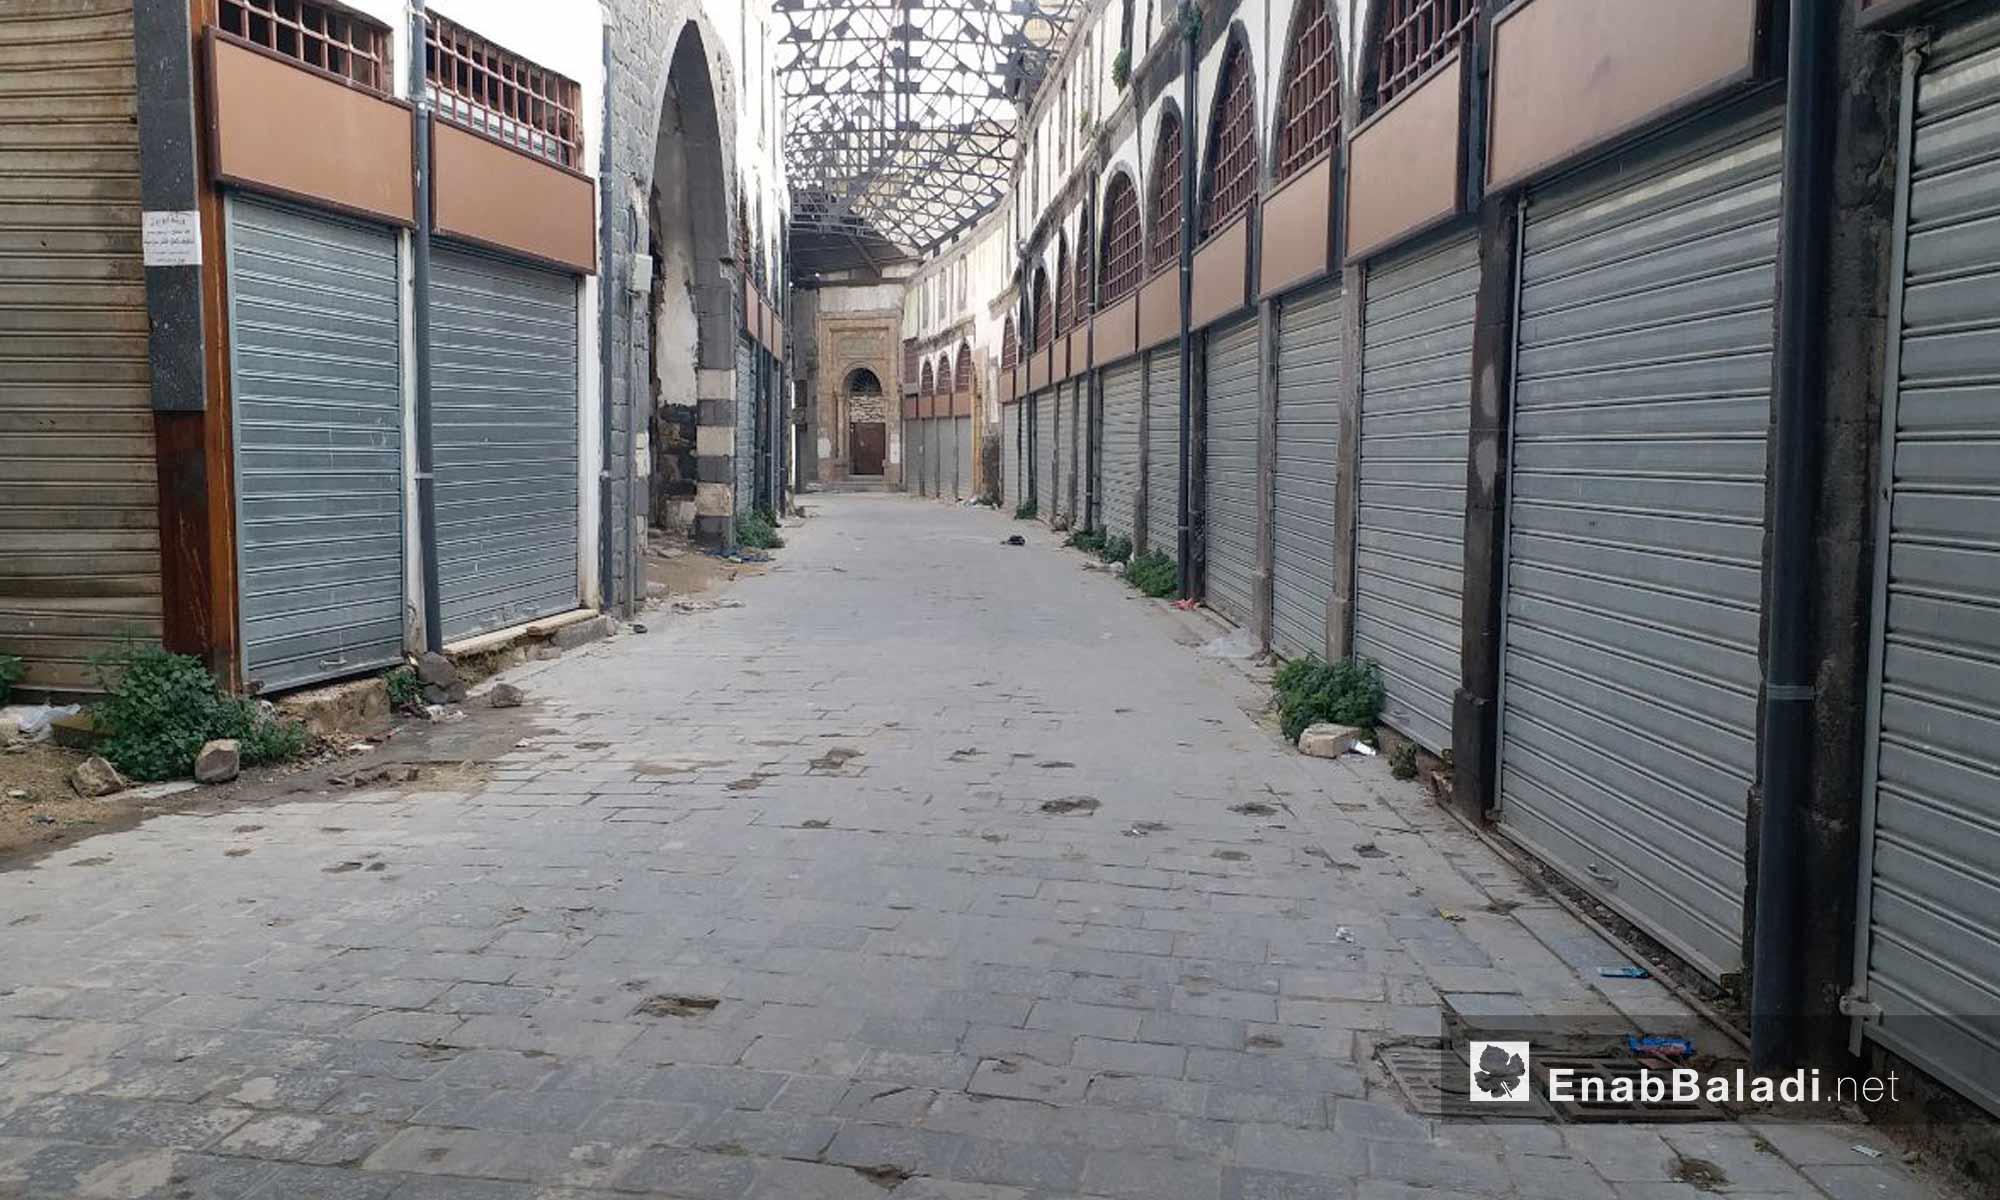 Old neighborhoods in the city of Homs - January 24, 2019 (Enab Baladi)